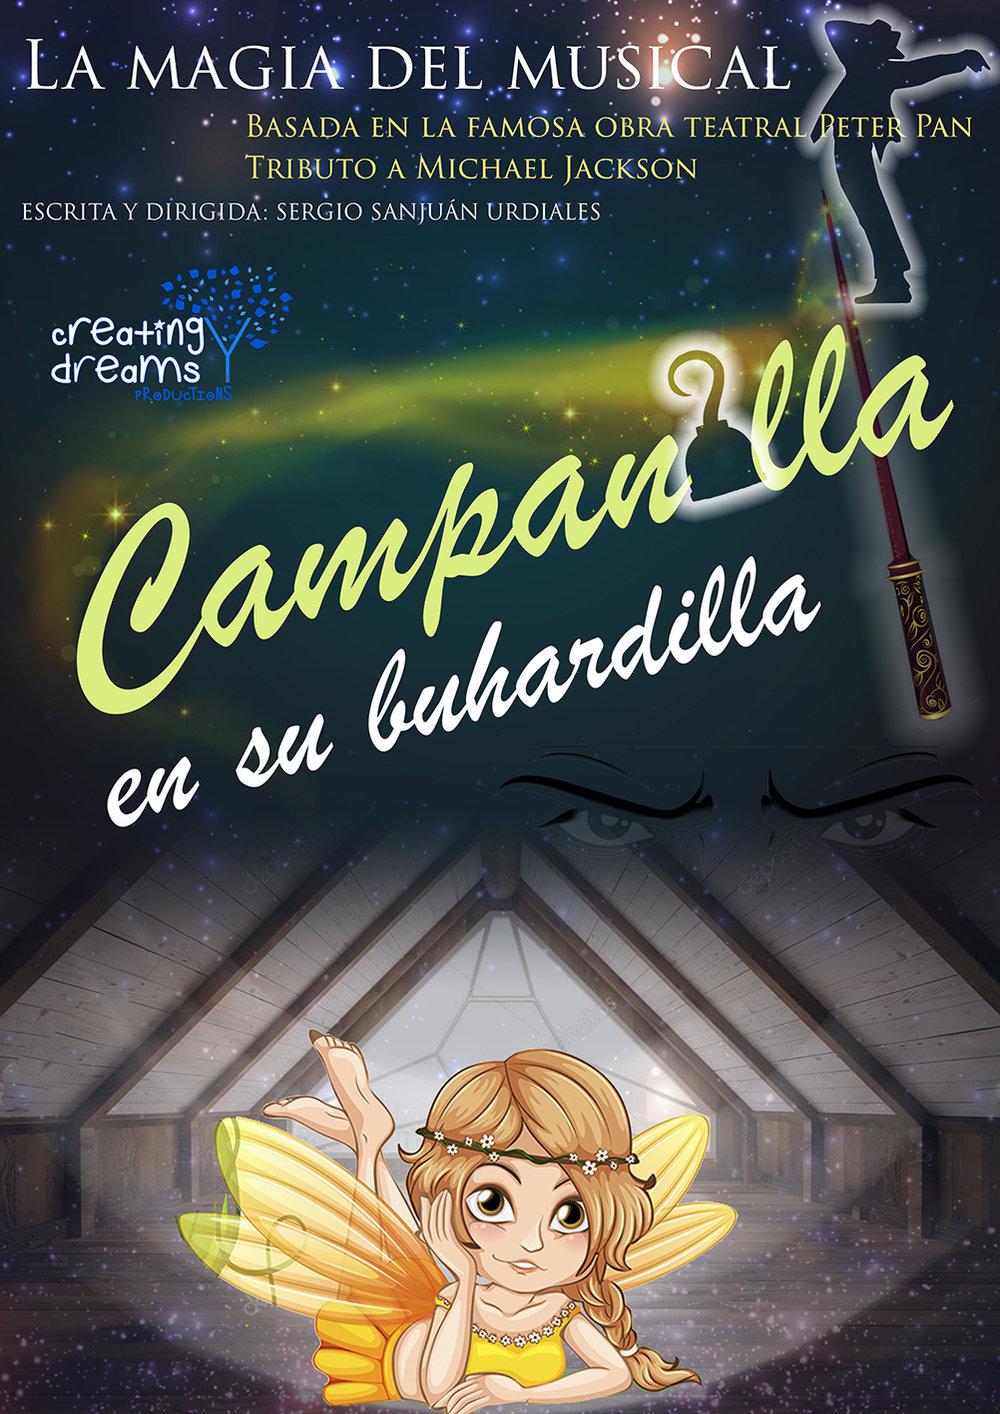 campanilla-carrion-valladolid.jpg